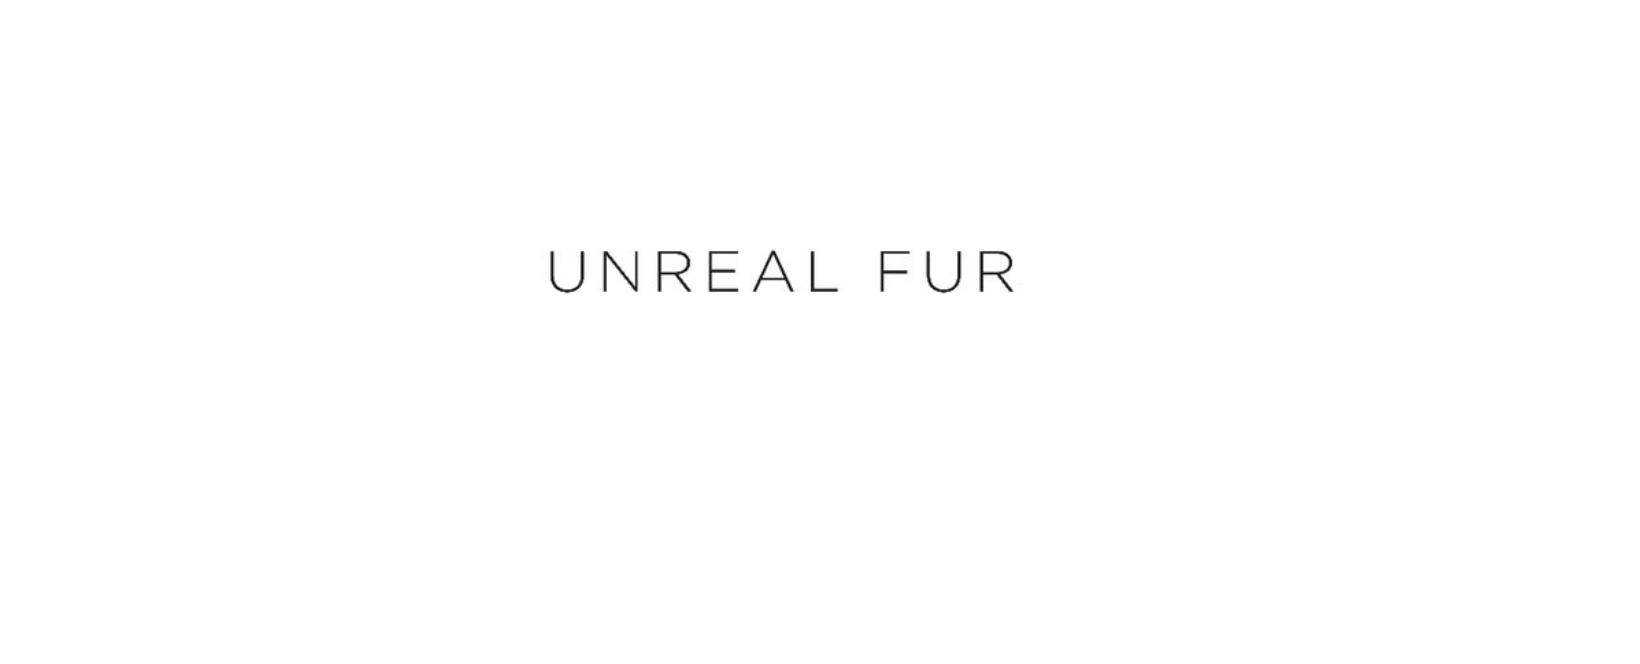 Unreal Fur Discount Code 2021